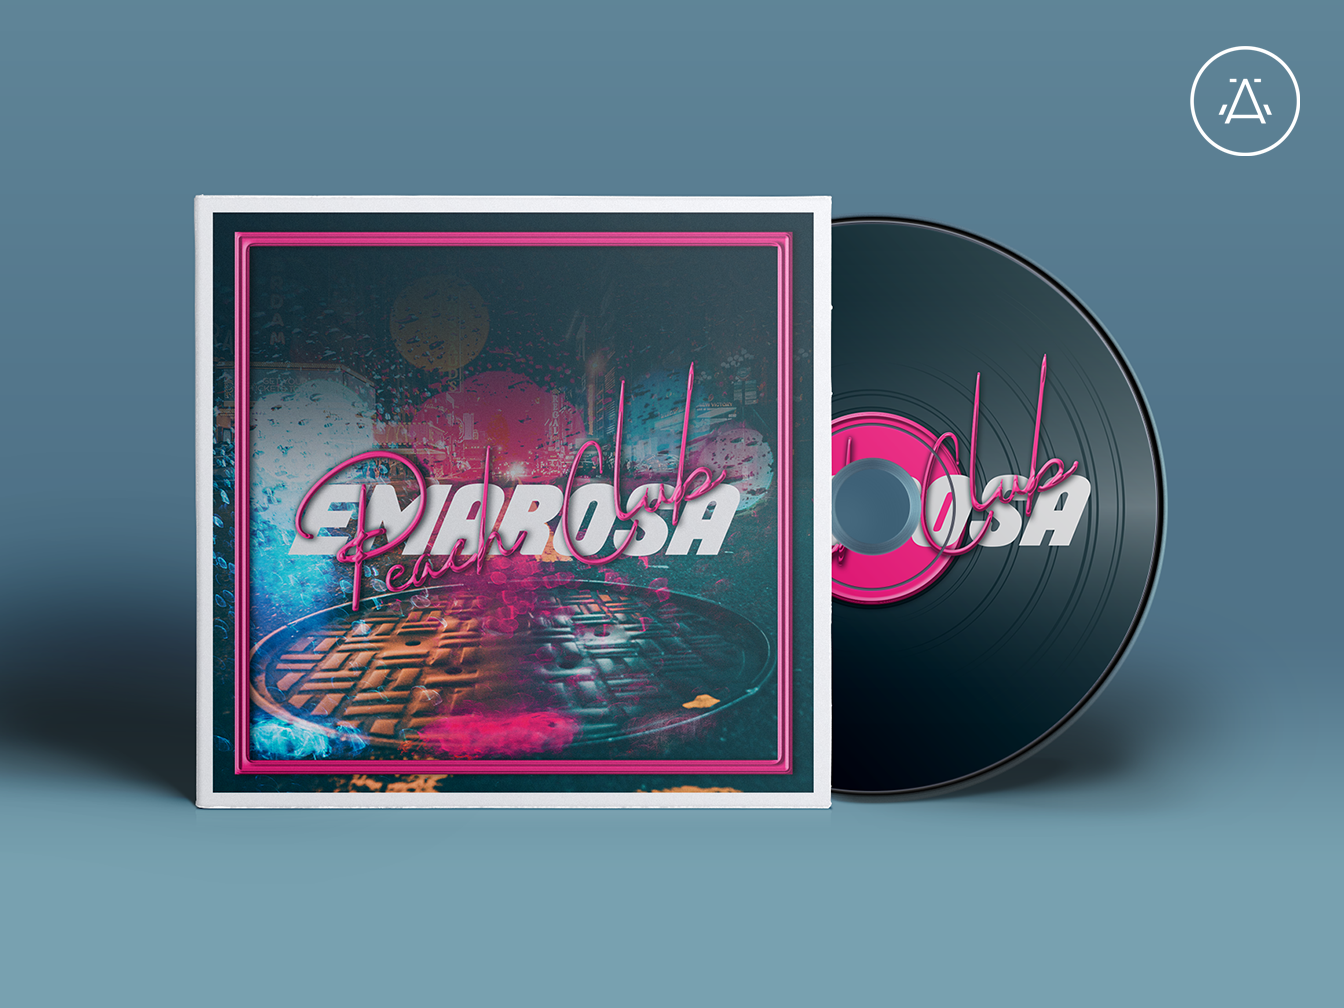 Emarosa Peach Club Album Artwork branding concept music art music album band design cd artwork album art band music music artwork vinyl art music album artwork branding emarosa